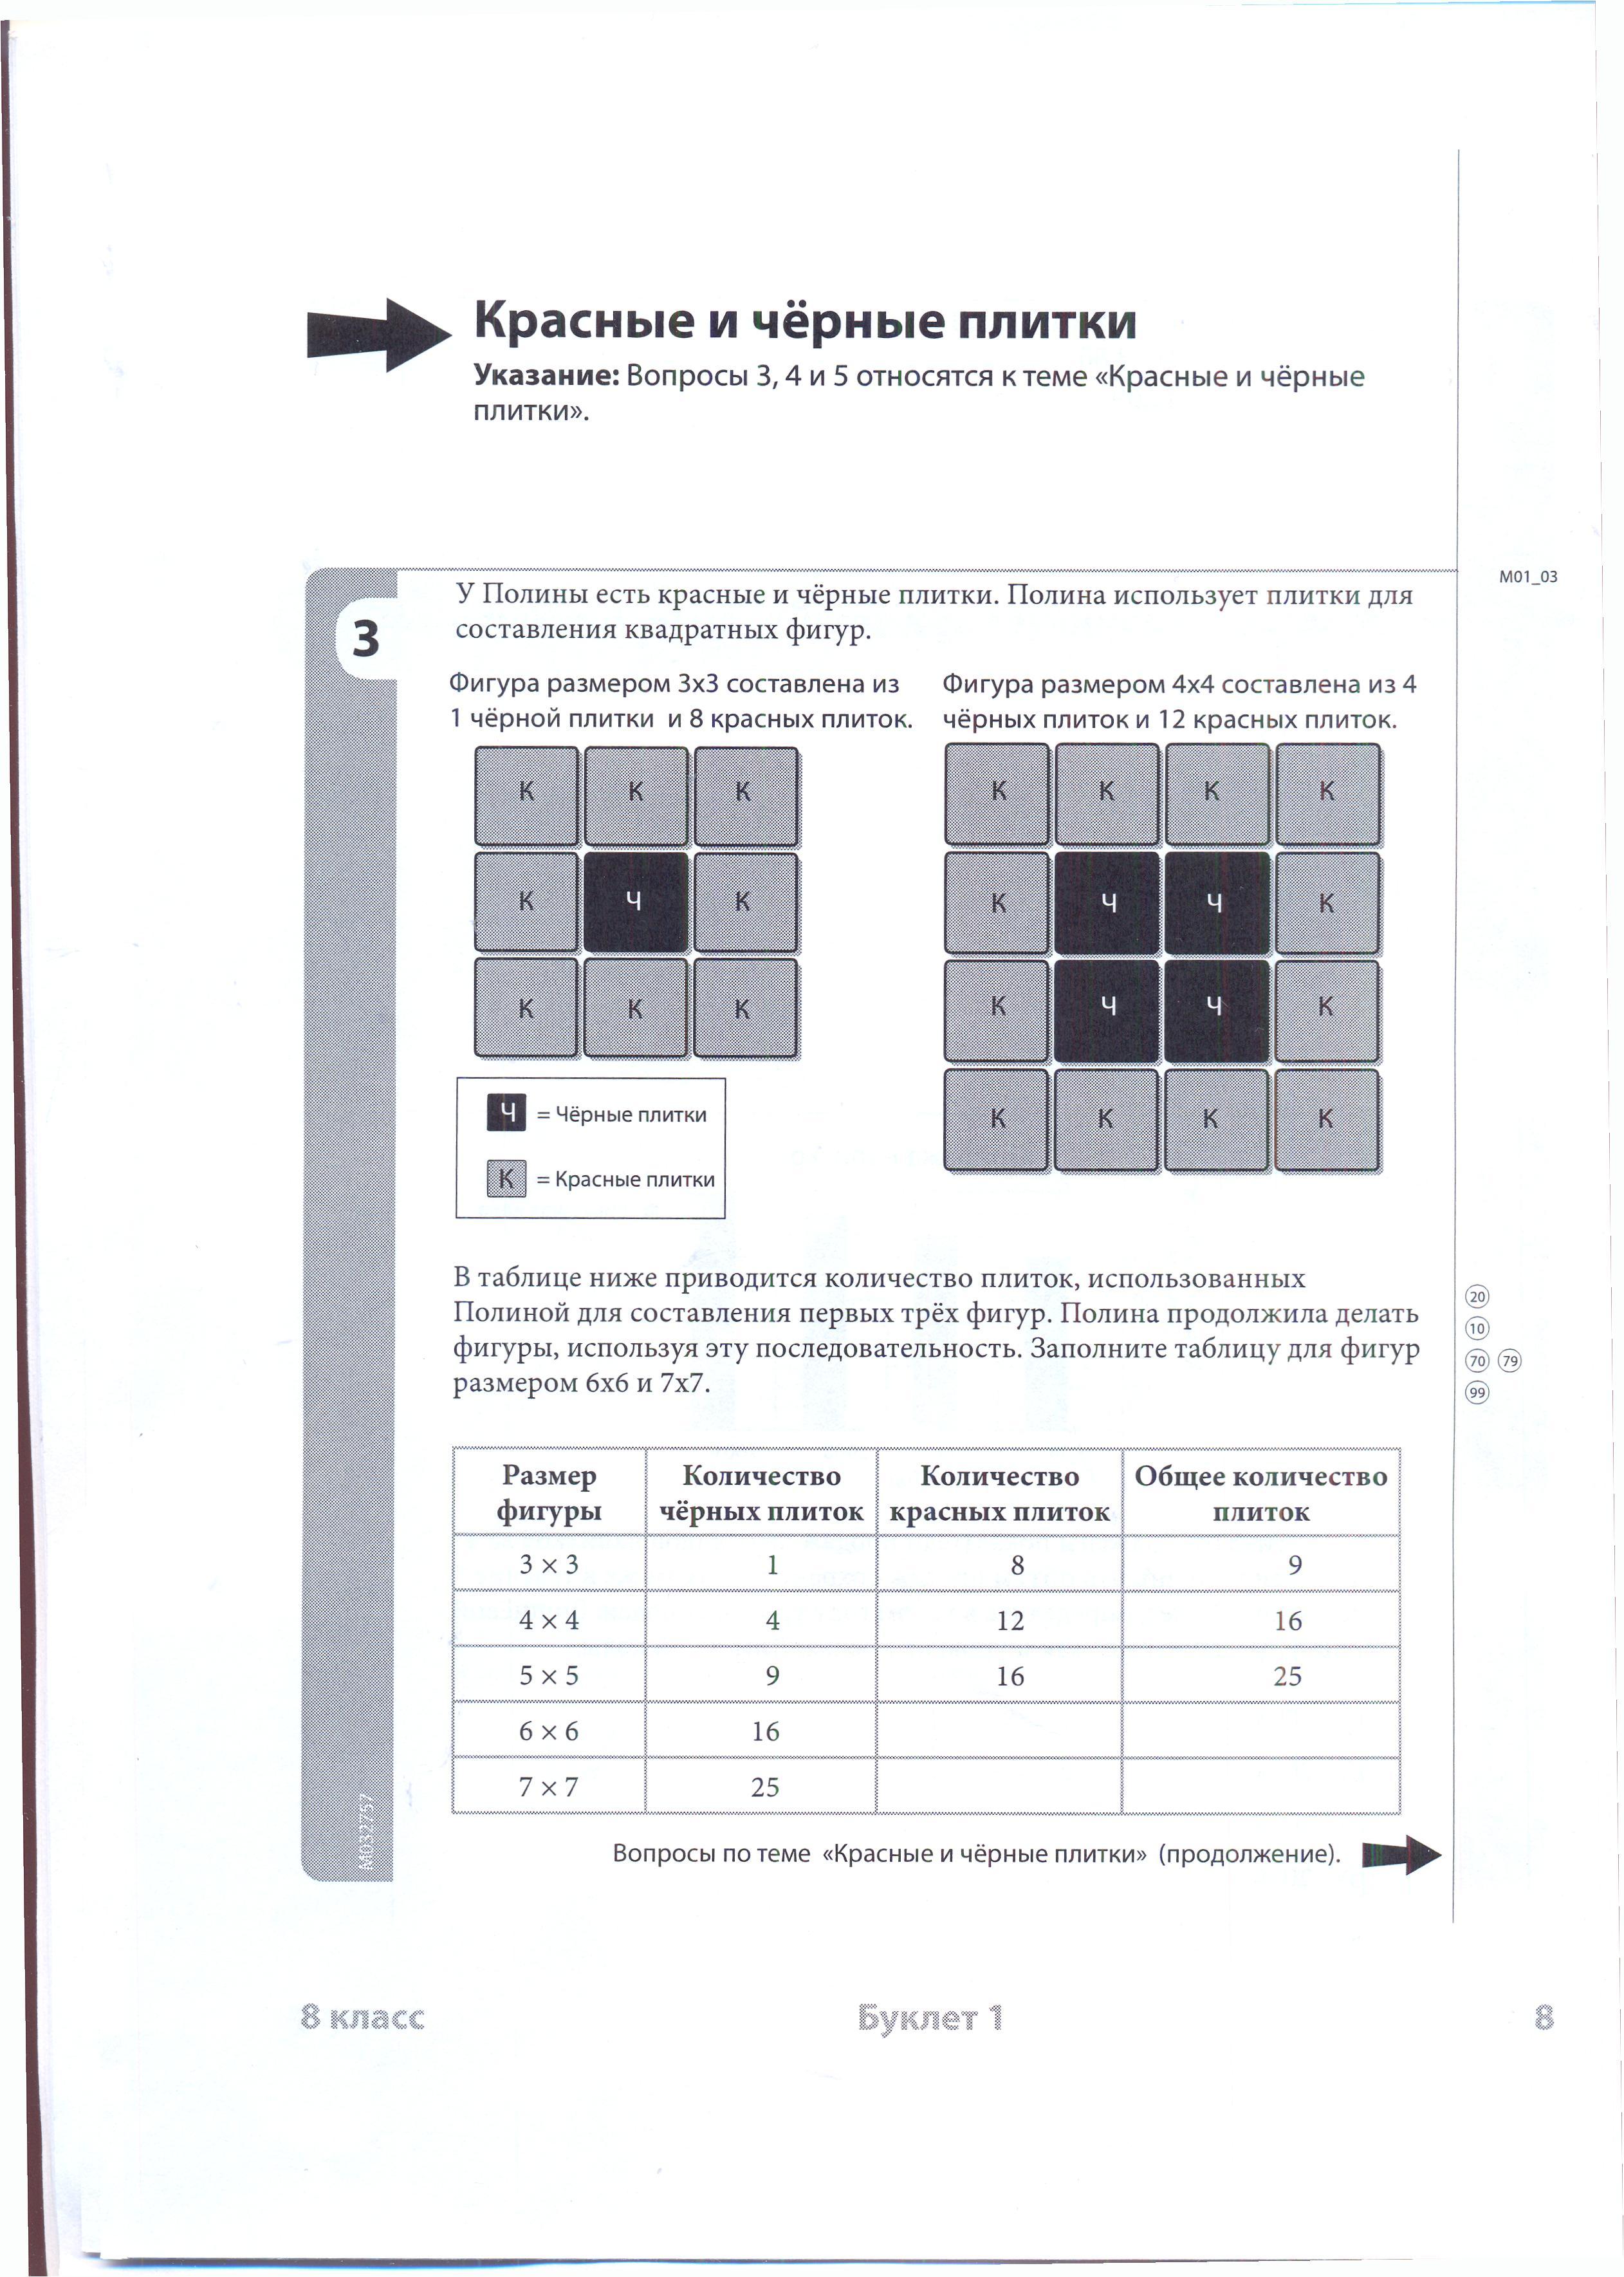 H:\Доклад ТИМСС Алматы 8.04.2014\TIMSS MATEM 8 kl_1 var\Matematic 8 kl_1 var0004.jpg